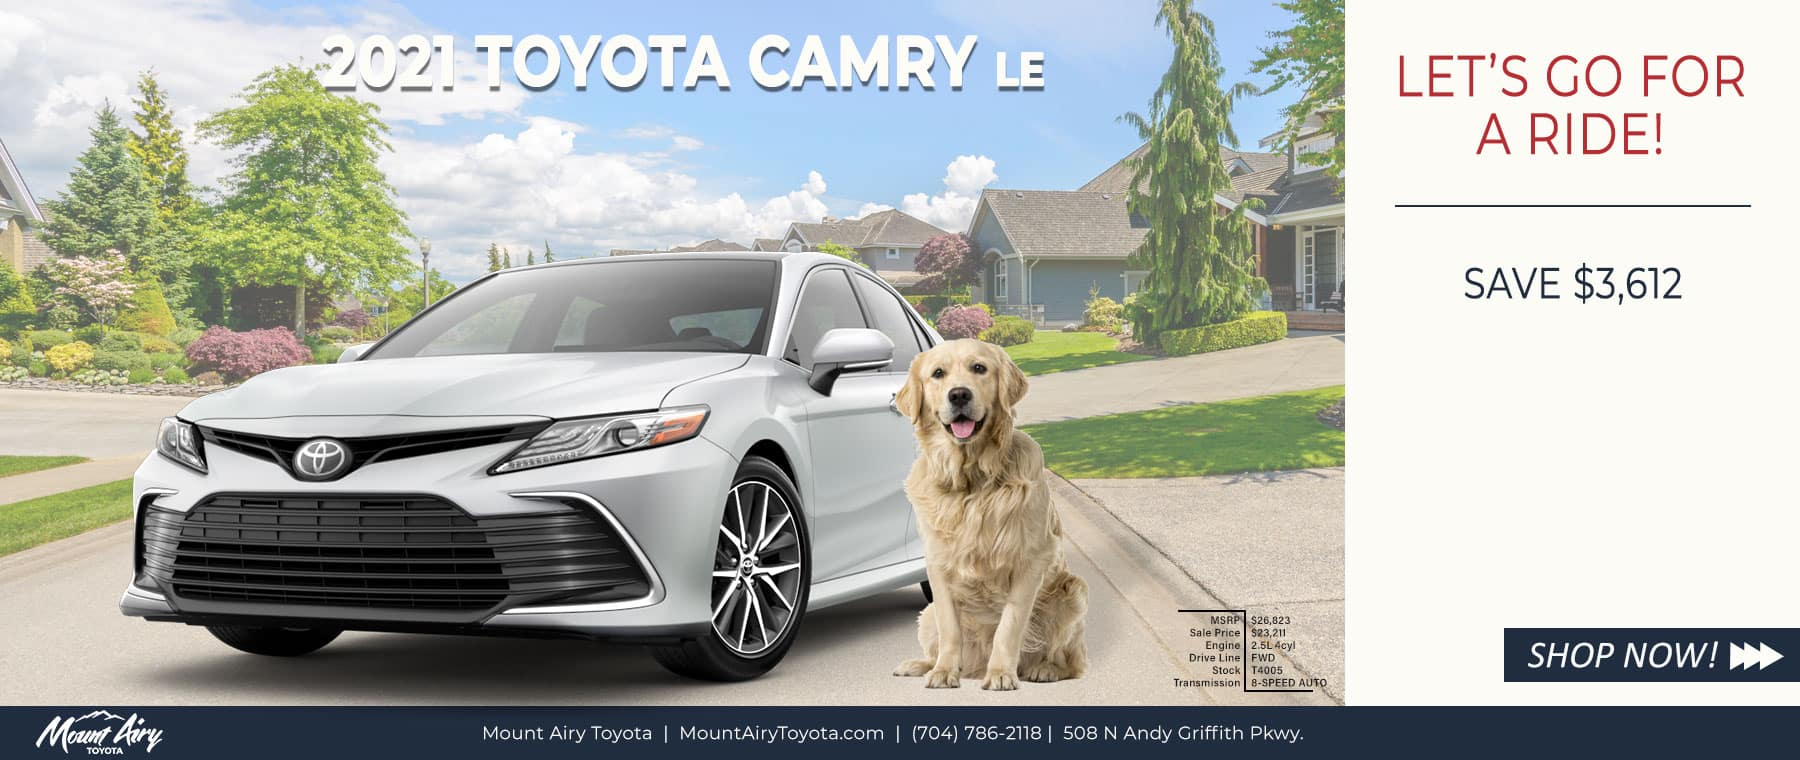 Toyota_April_Camry